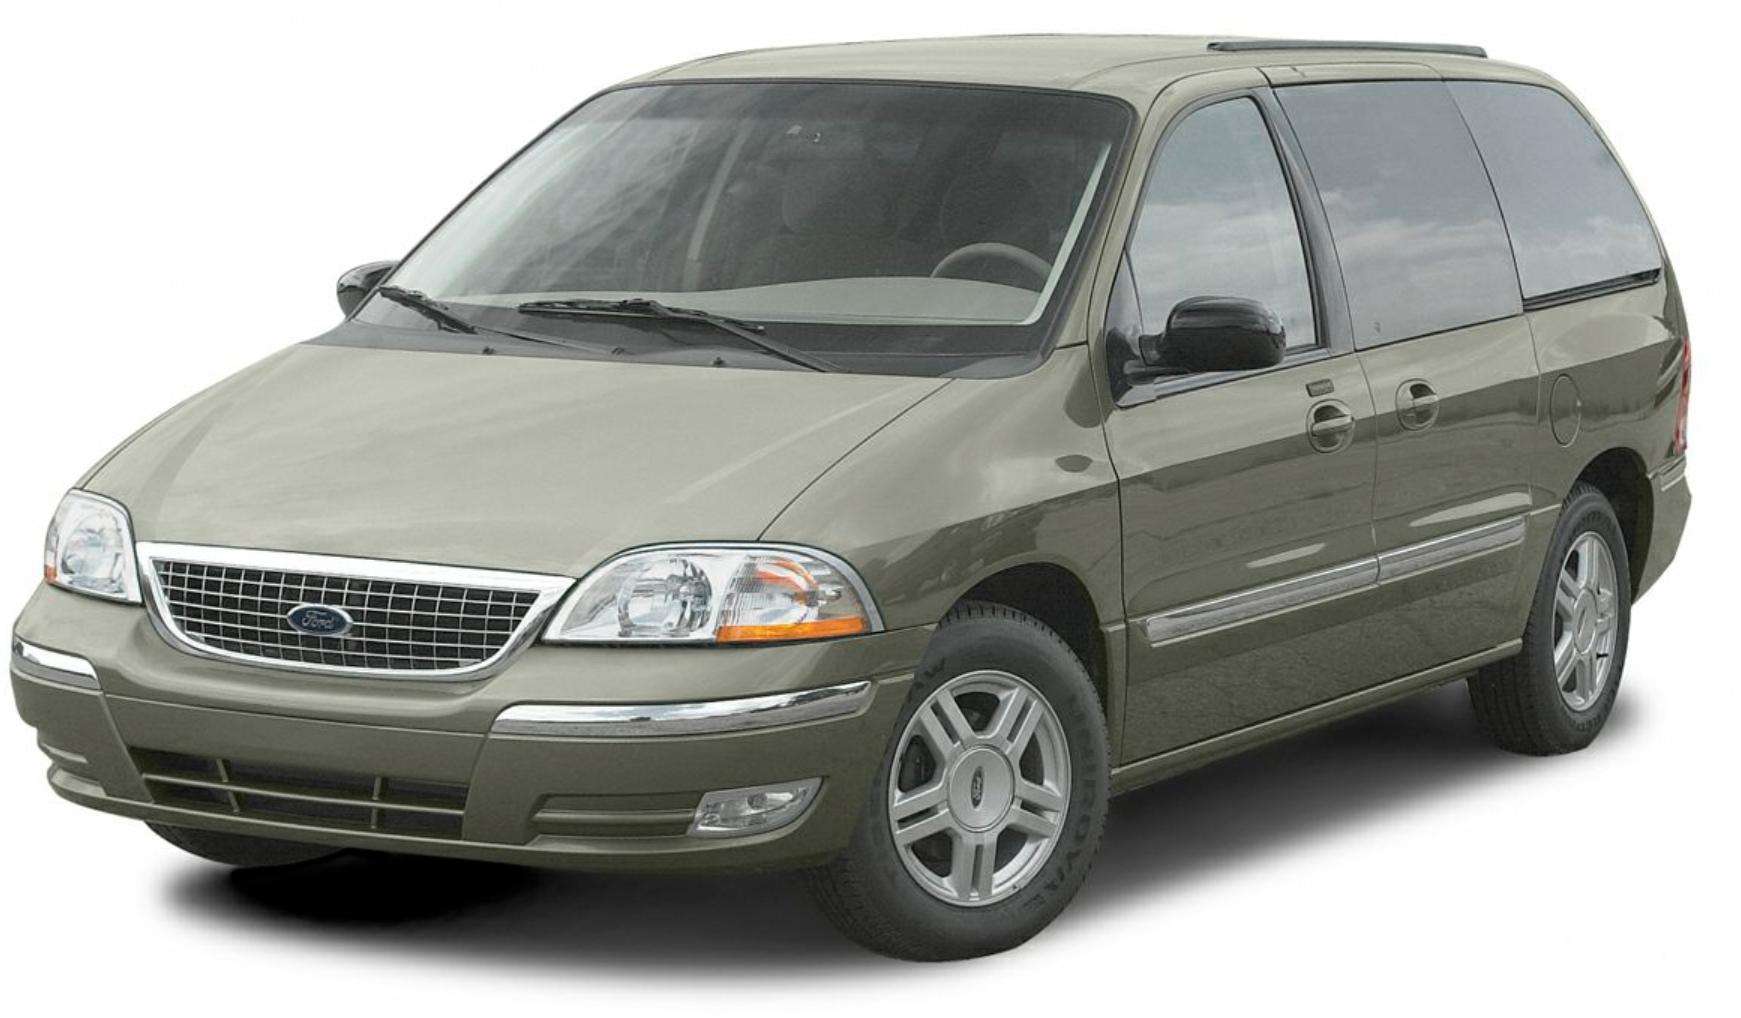 Ford Windstar com fundo branco